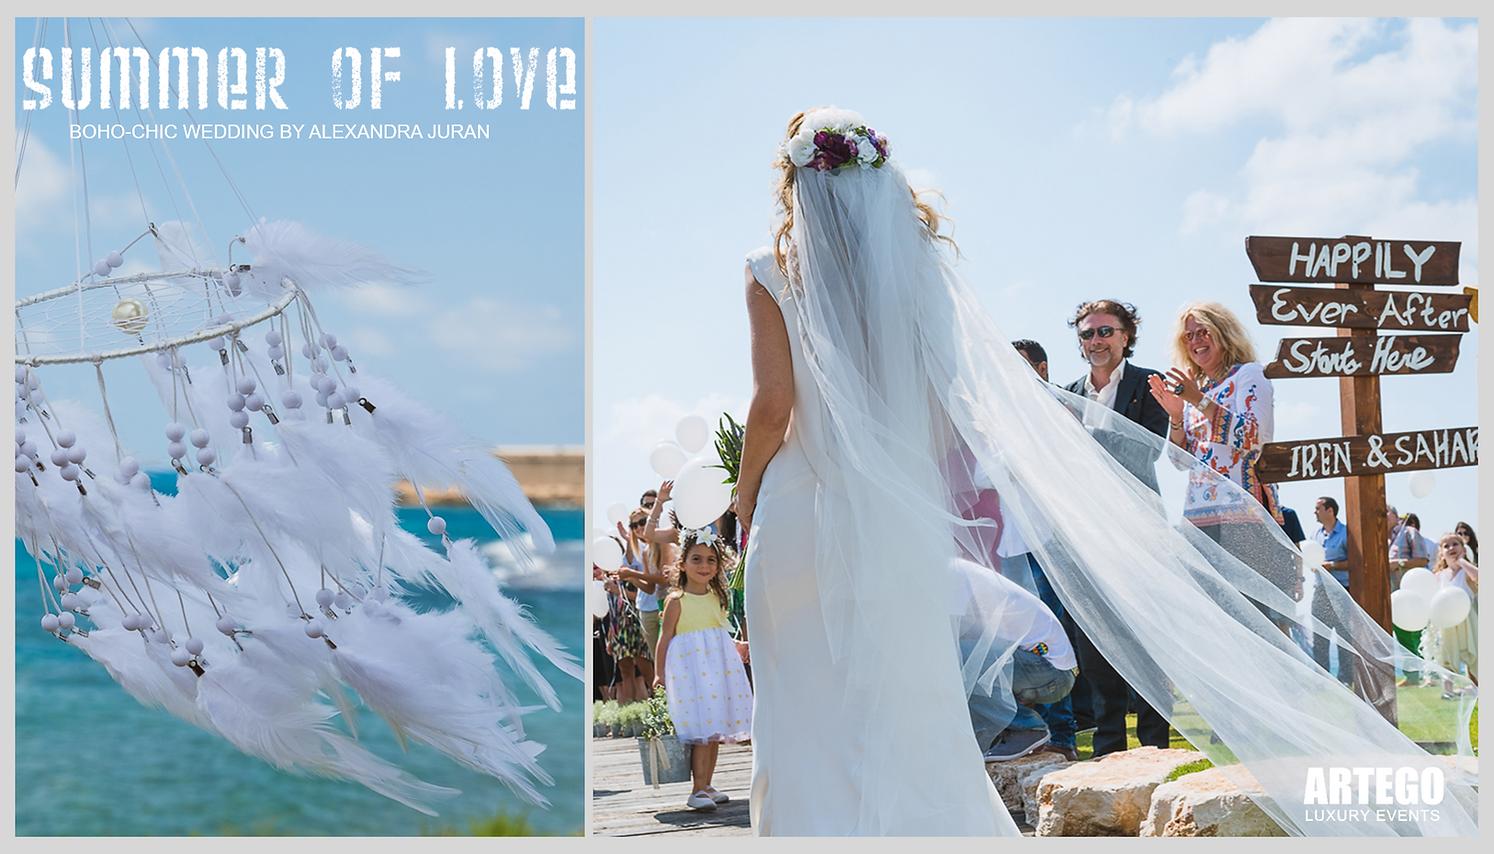 ALEXANDRA JURAN ARTEGO BOHO-WEDDING.png